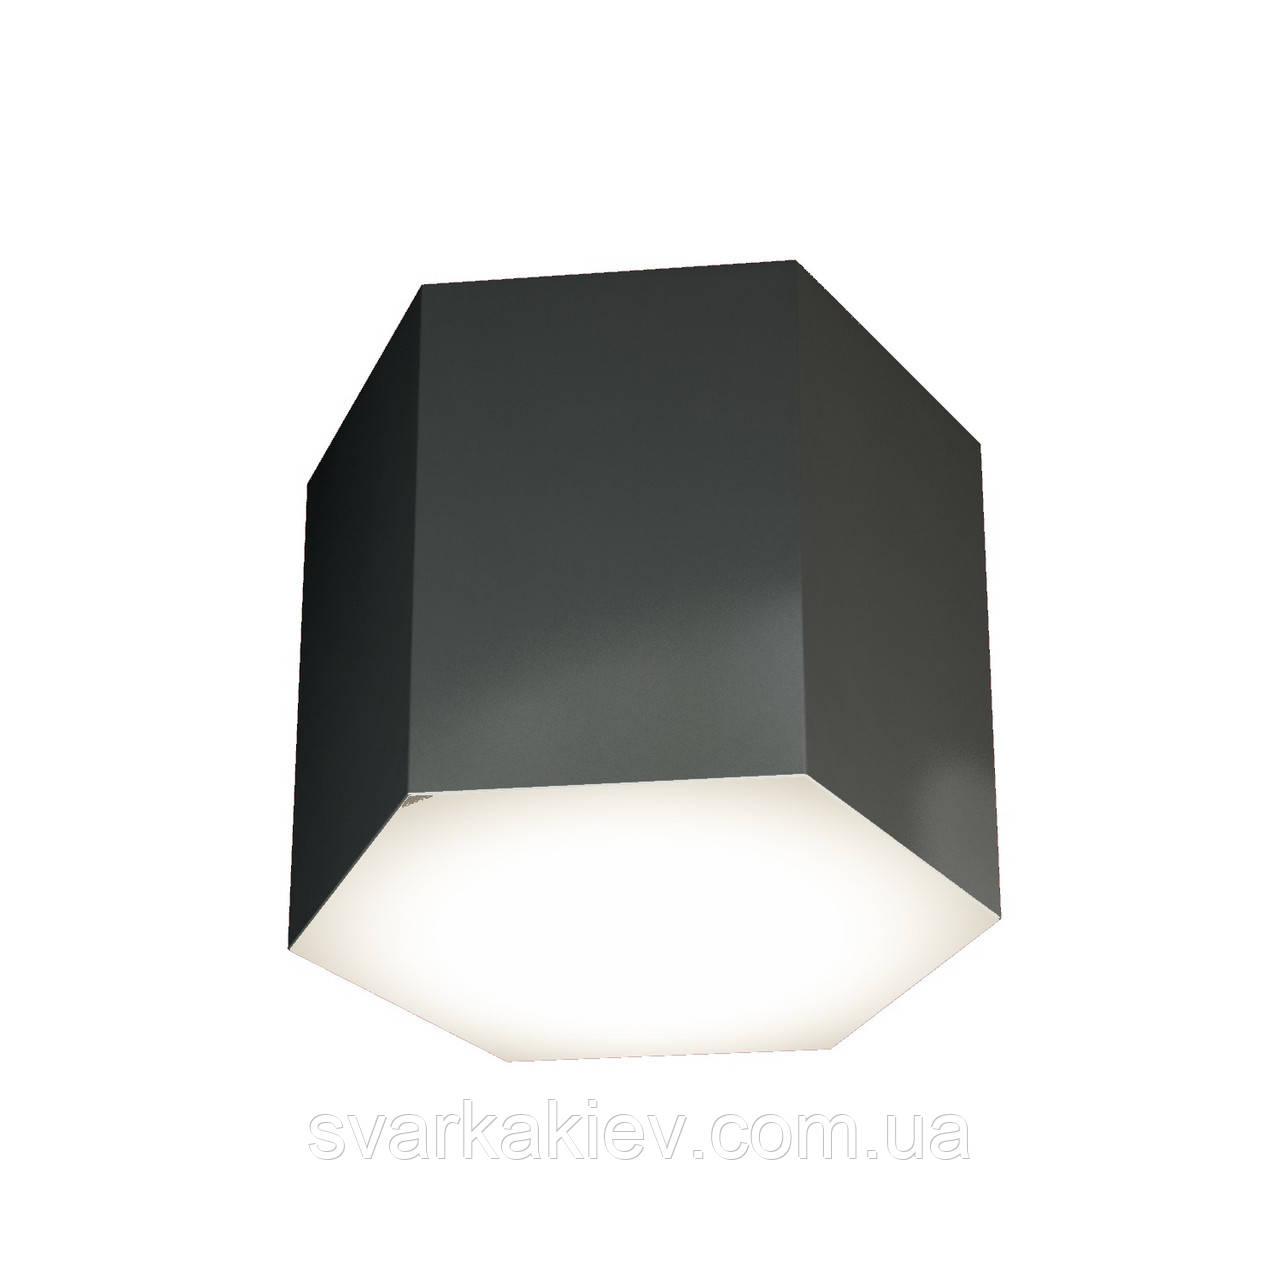 LED светильник потолочный Ceiling Lamp Cleo 15W L BL